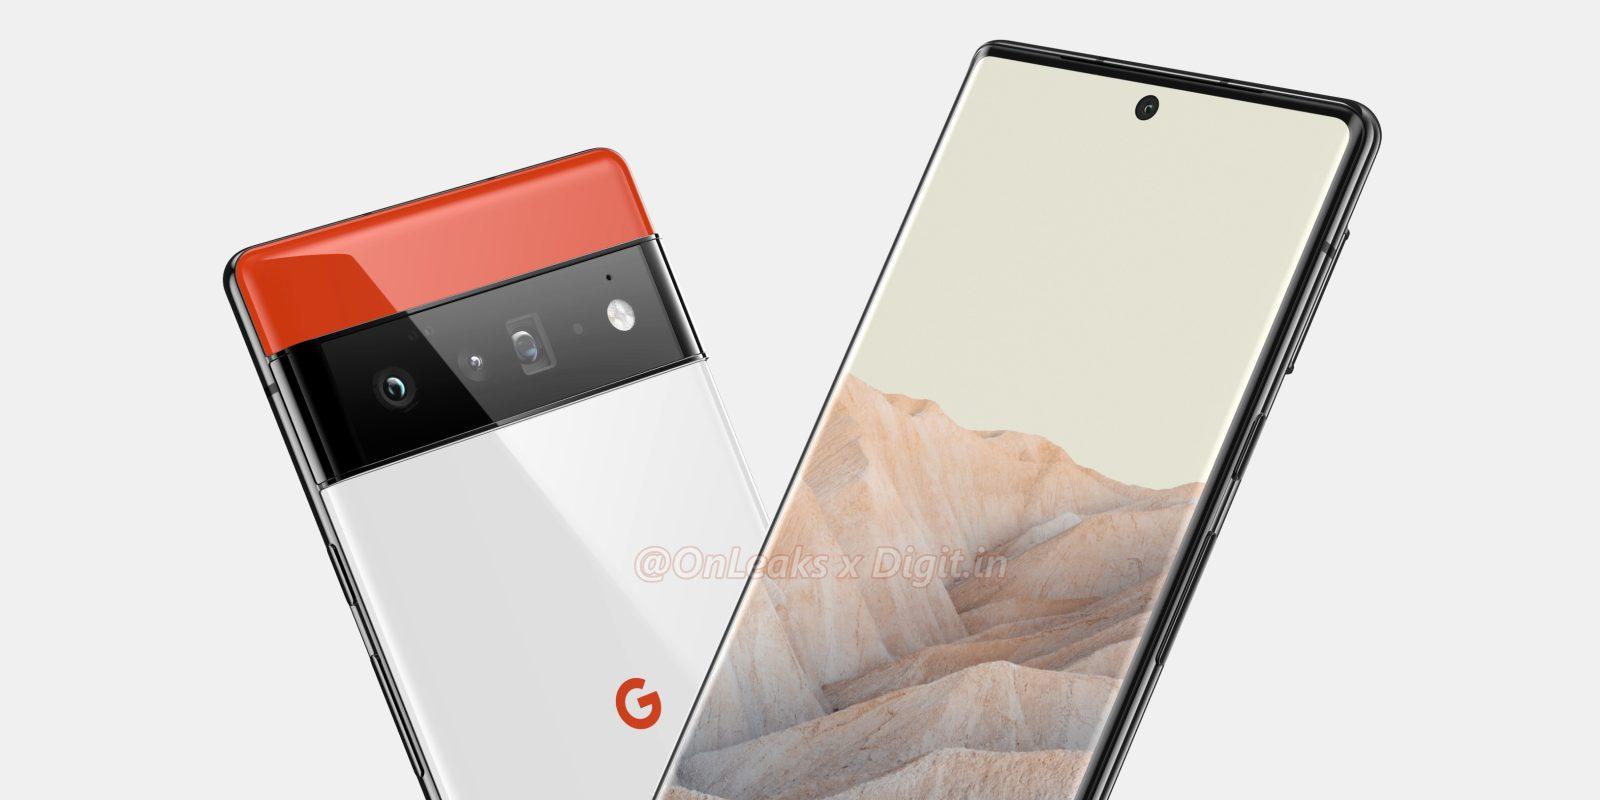 google pixel and picel pro comparison